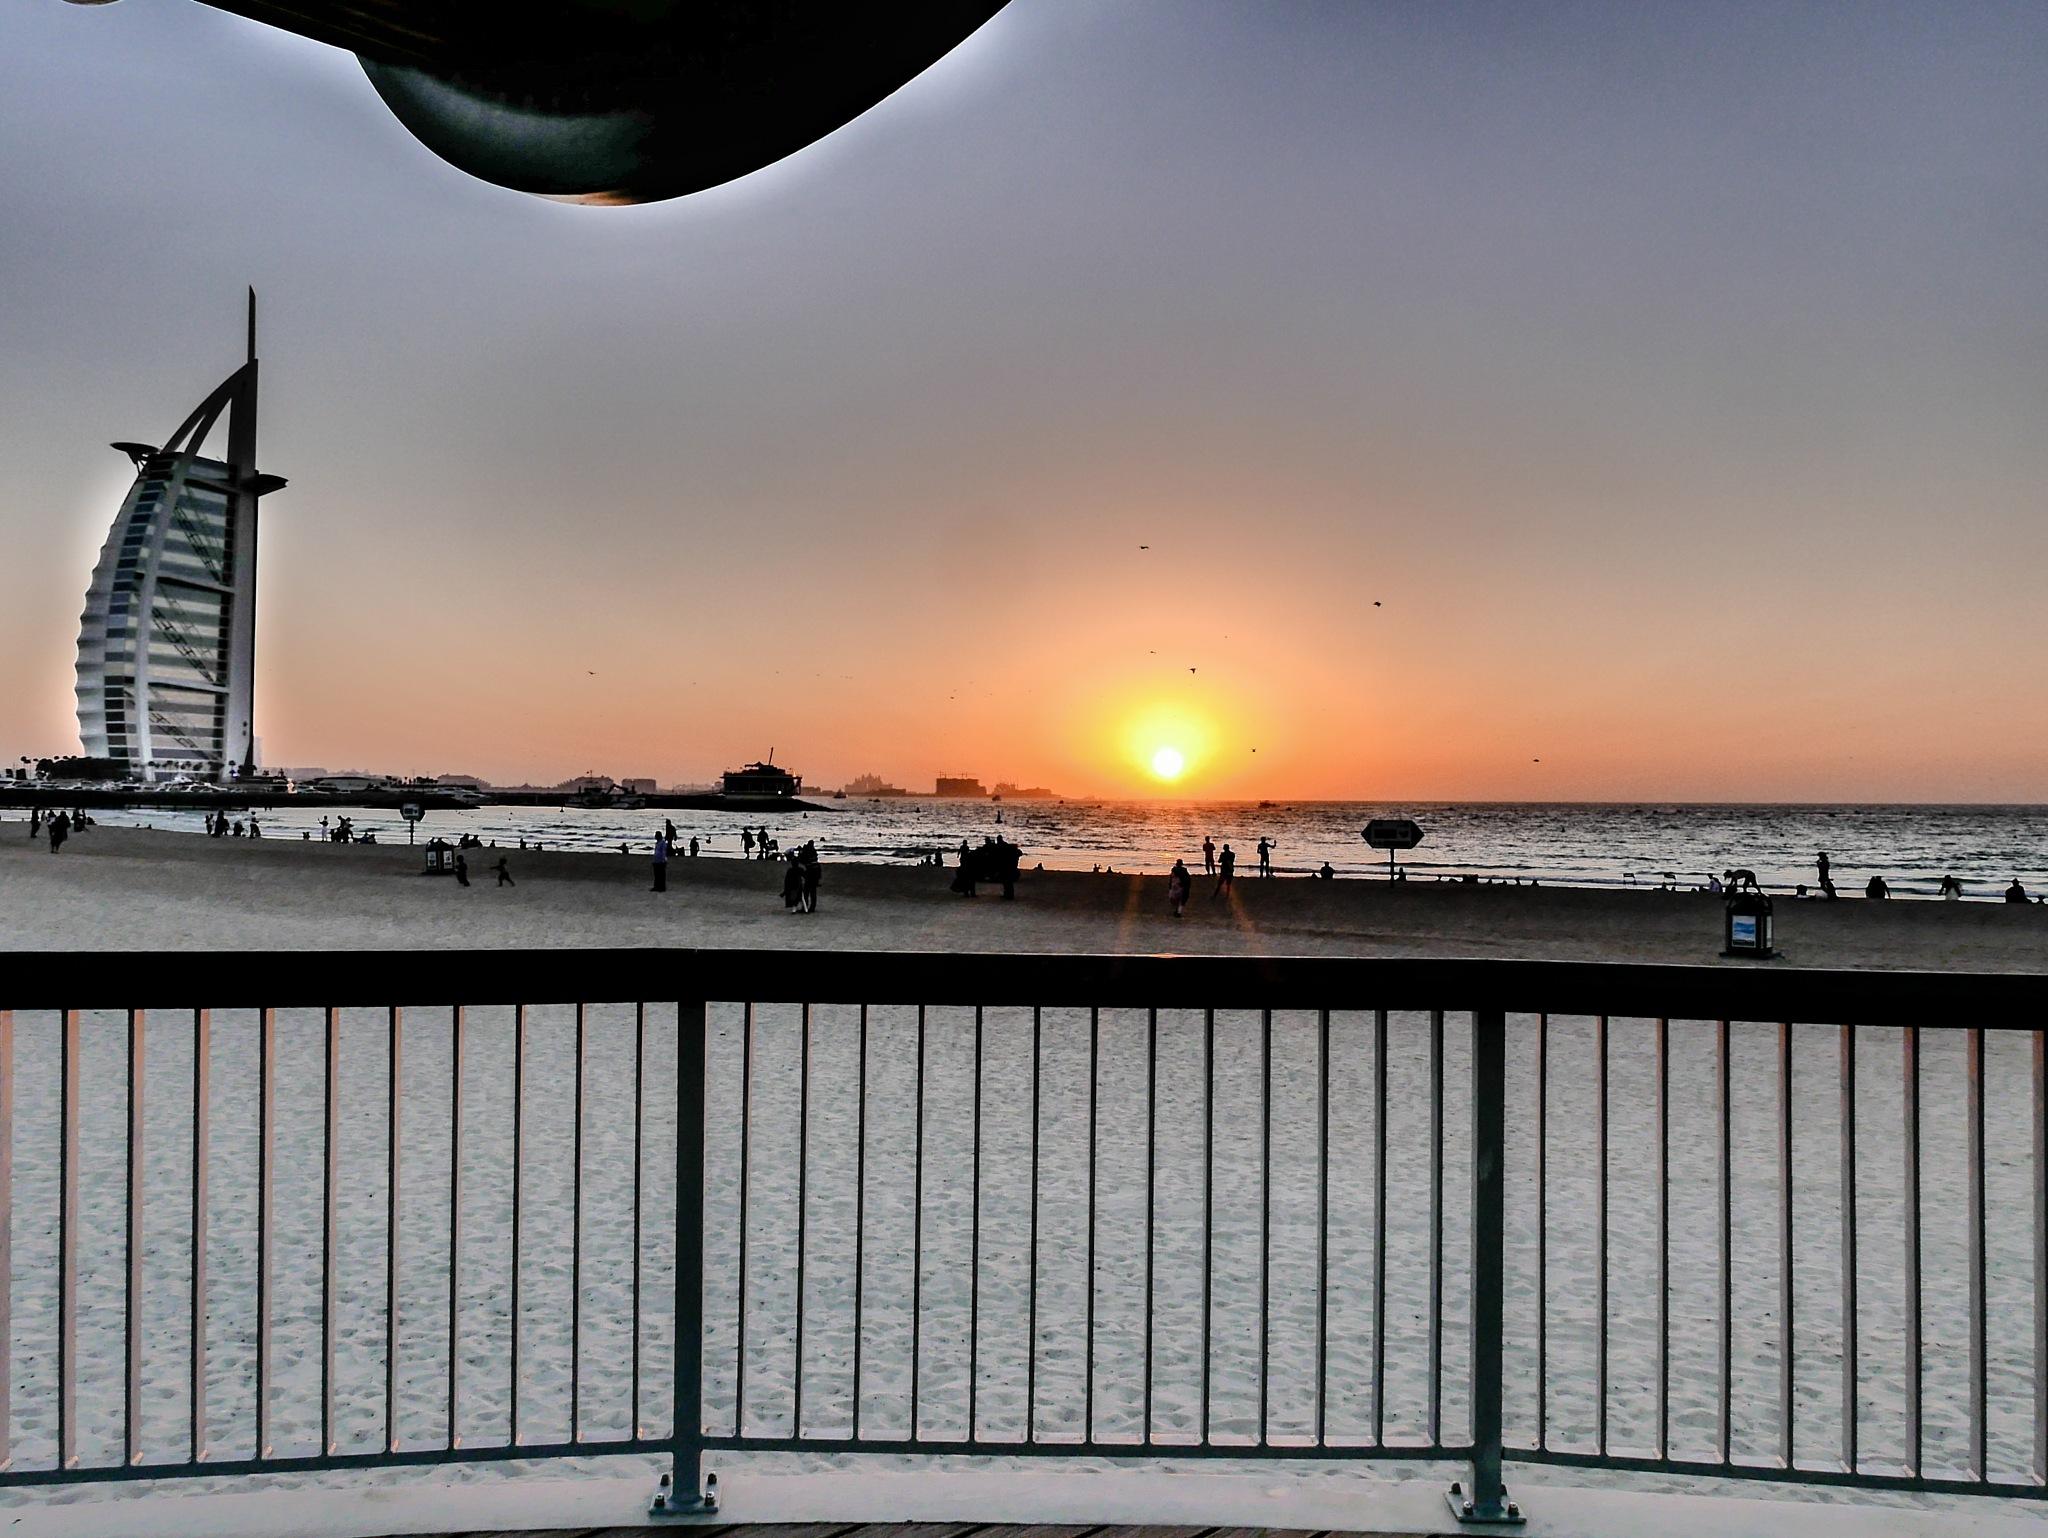 Burj Sunset, Dubai 2018 by dxbimran